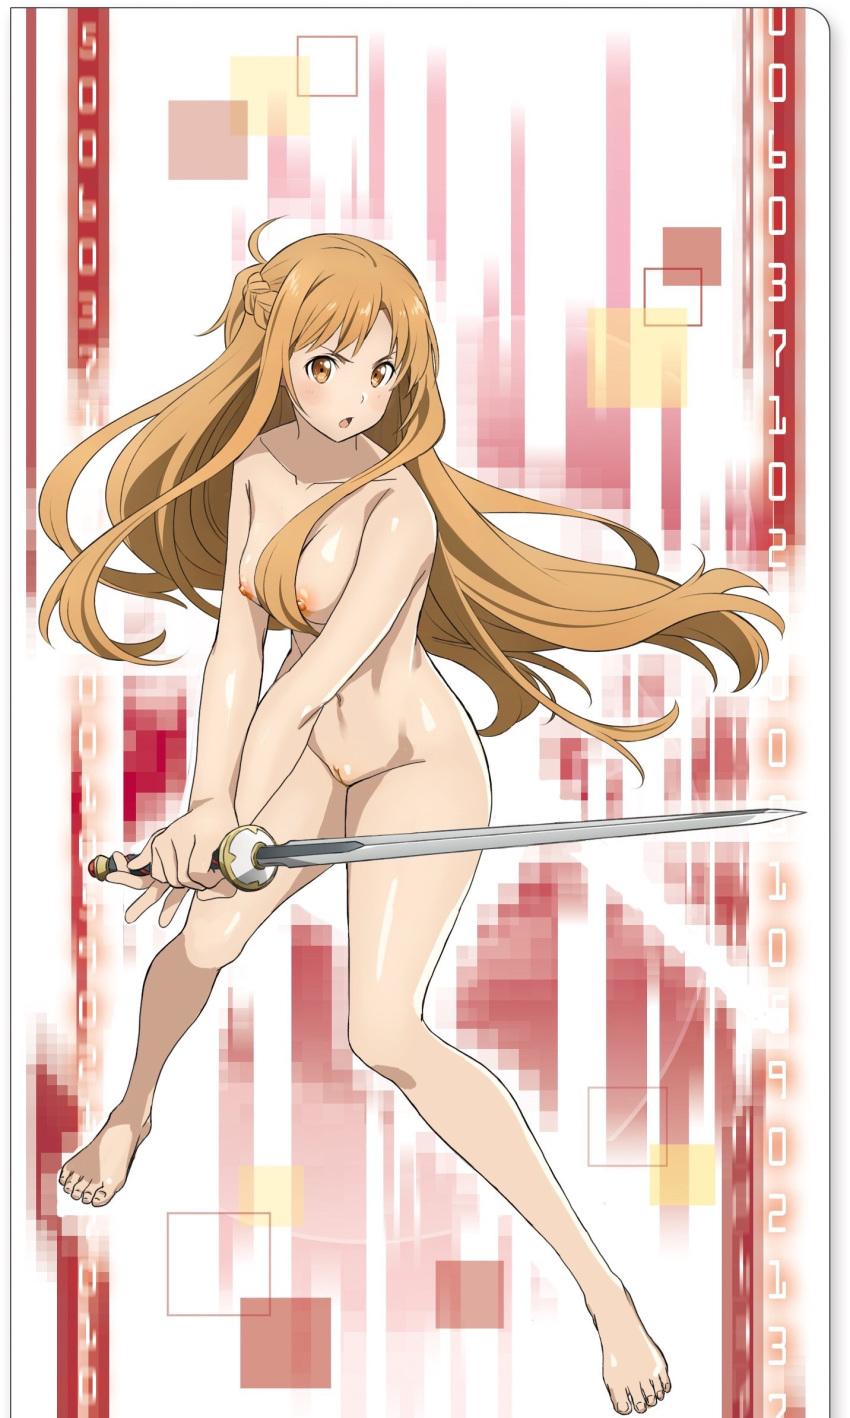 art sword nude asuna online Lara croft sfm porn gif